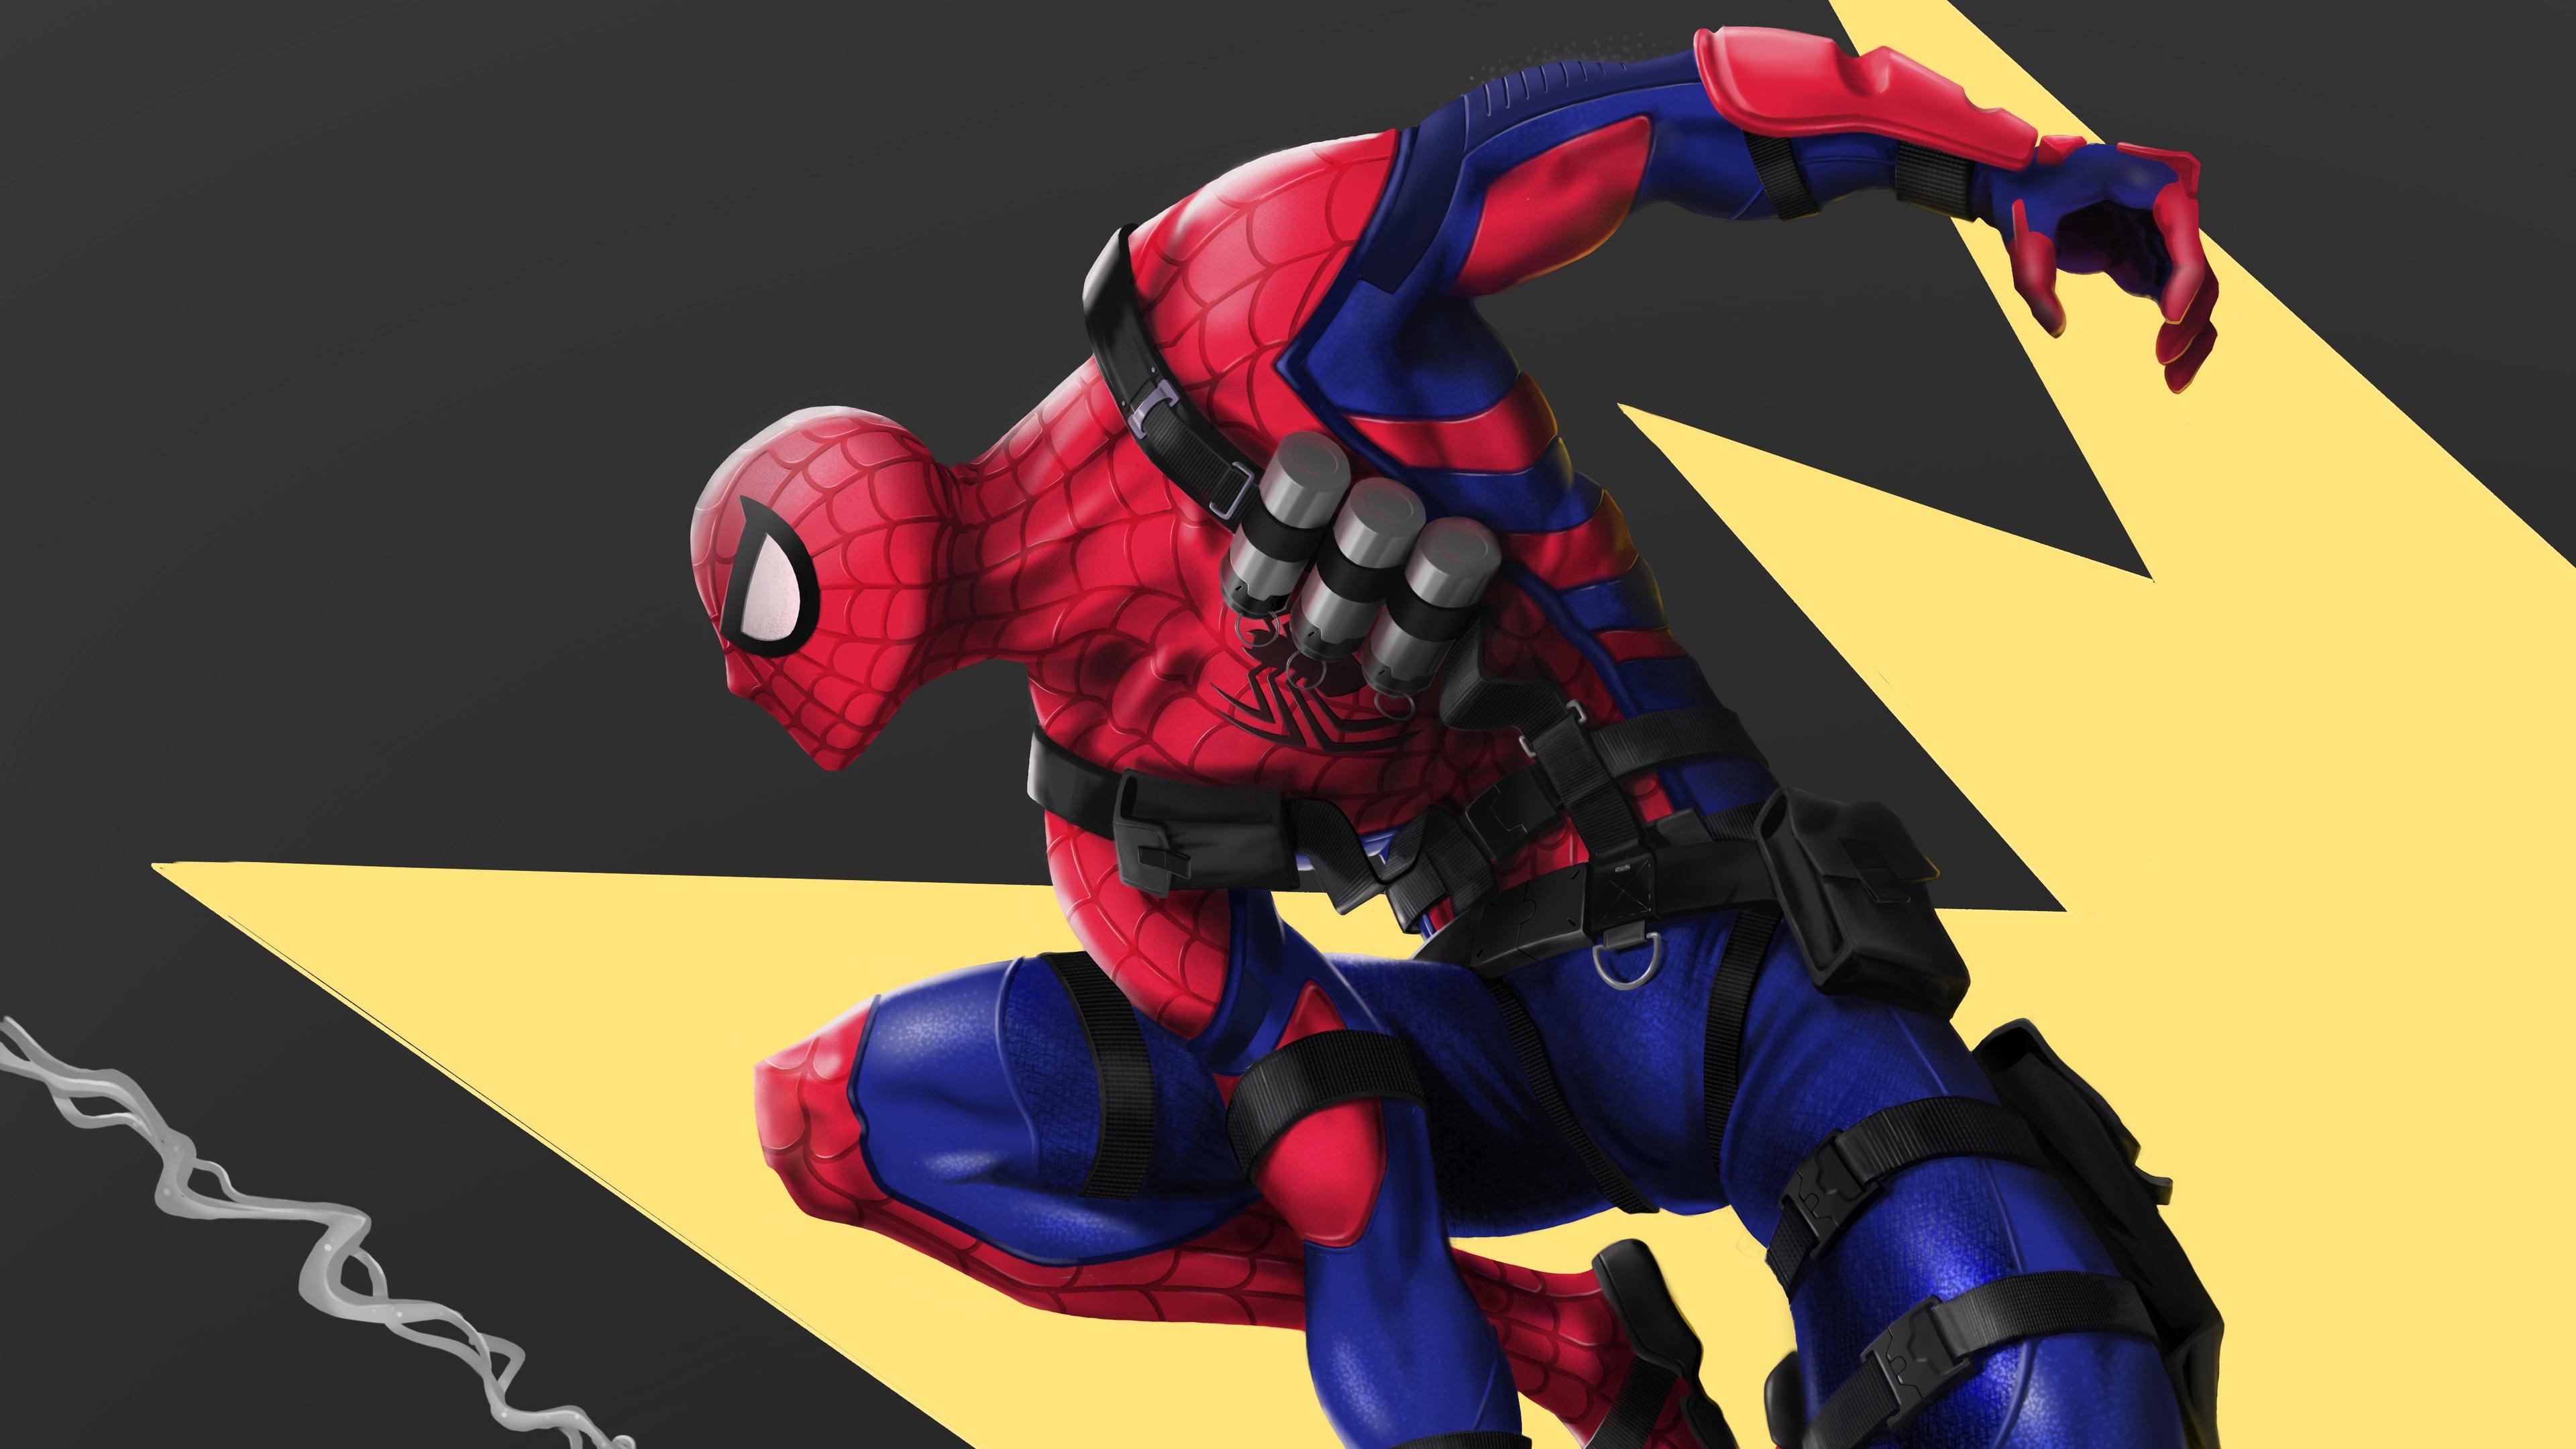 spiderman with arms 4k 1619216039 - Spiderman With Arms 4k - Spiderman With Arms 4k wallpapers